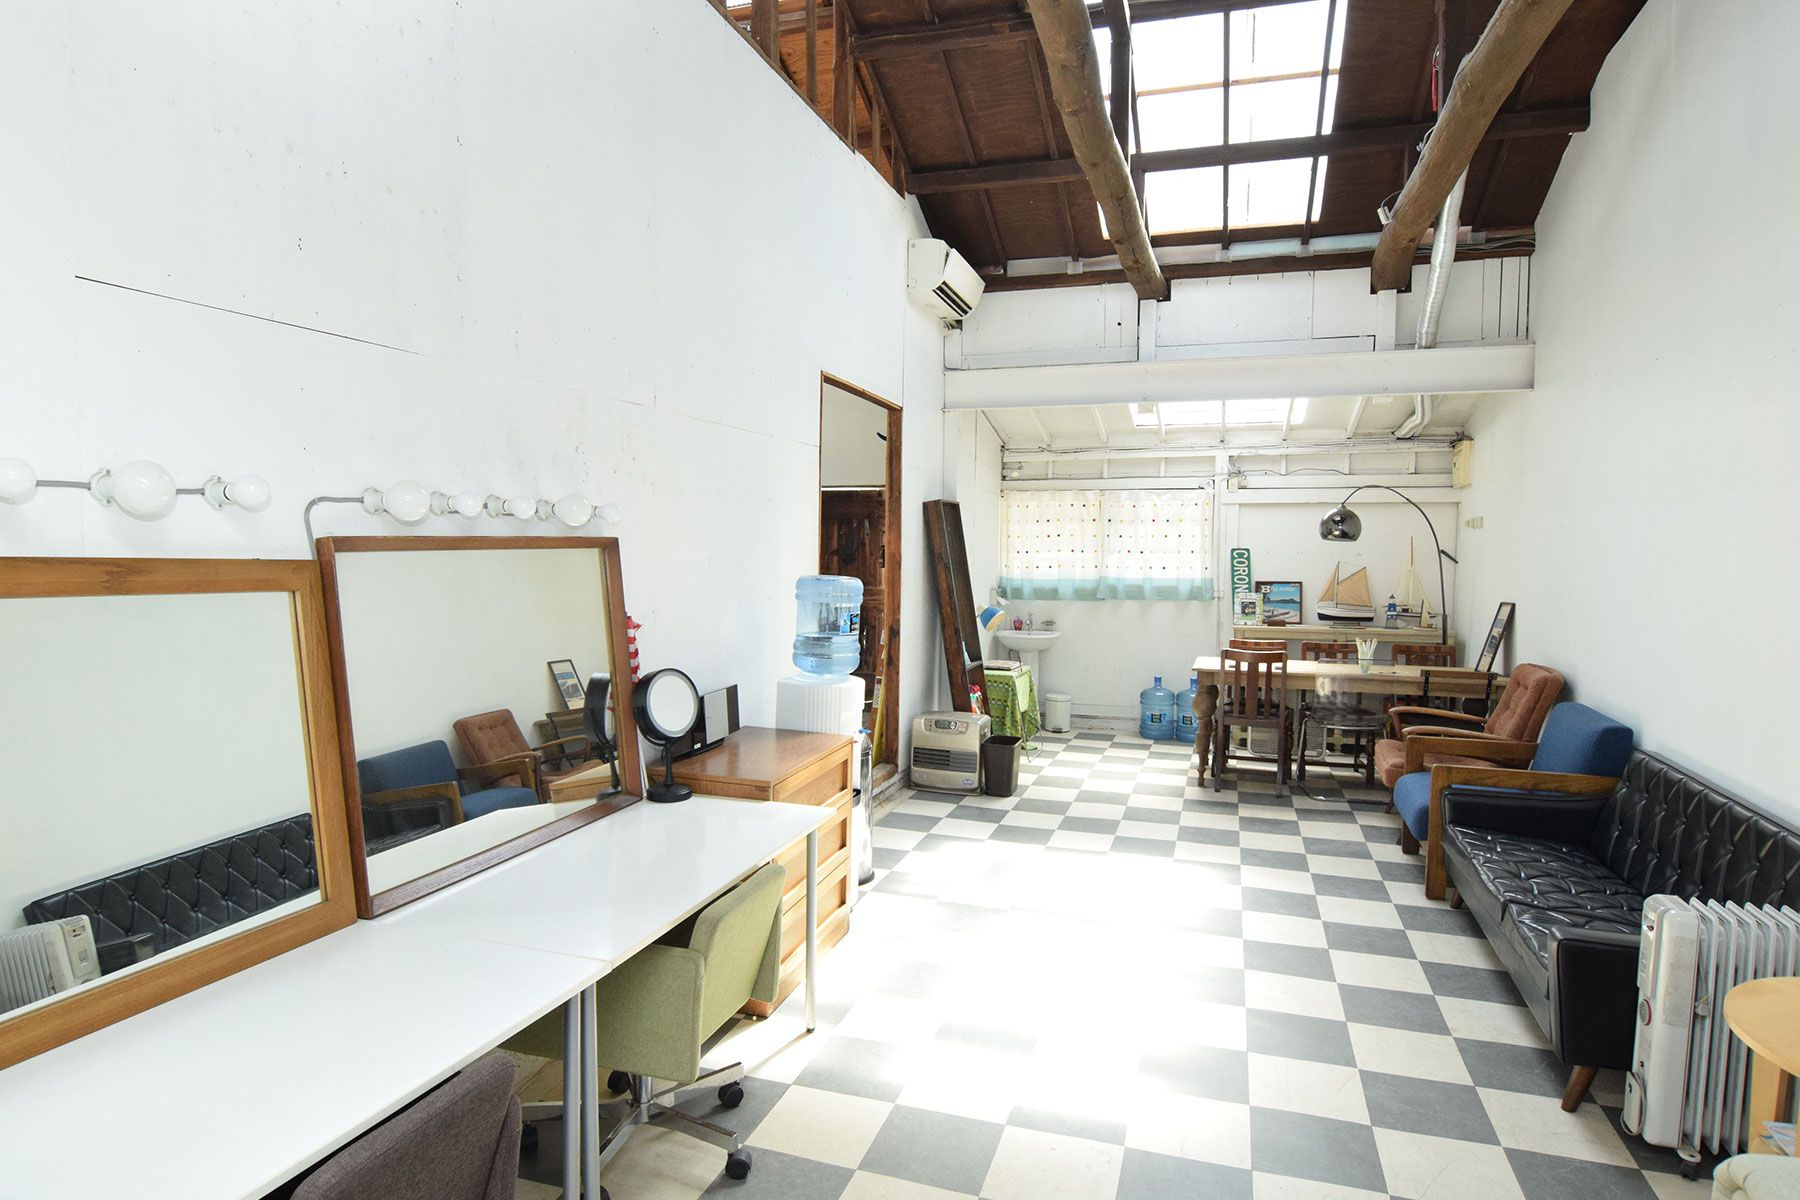 STUDIO LOPEZ 茅ヶ崎スペース (スタジオ ロペス)メイクルームなどでも使用可能